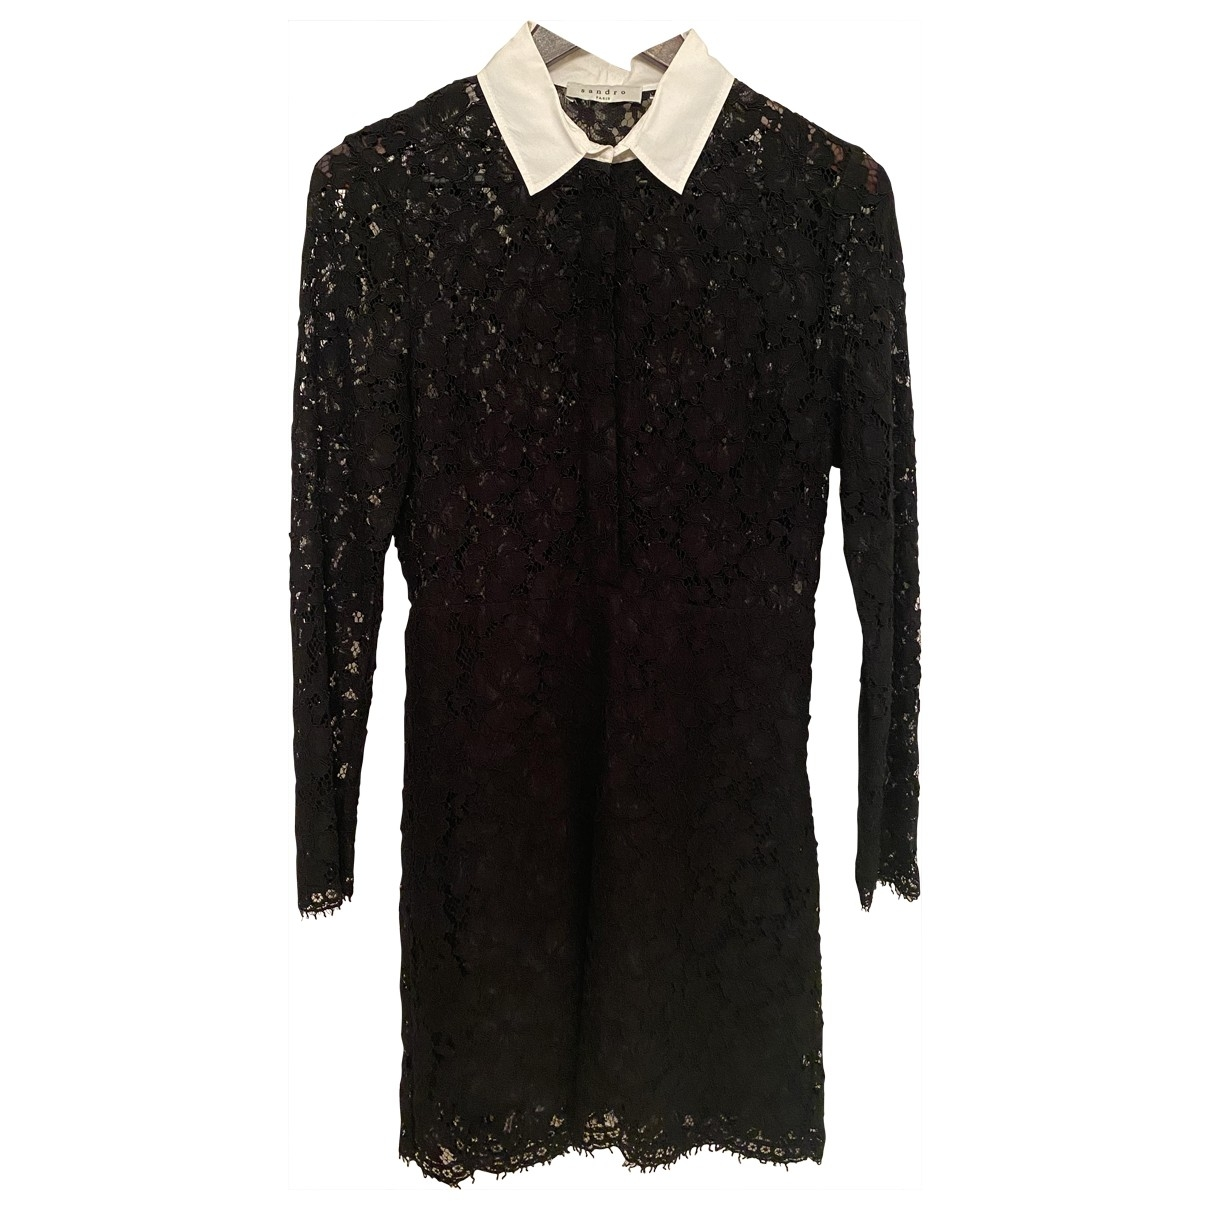 Sandro \N Black Lace dress for Women 2 0-5